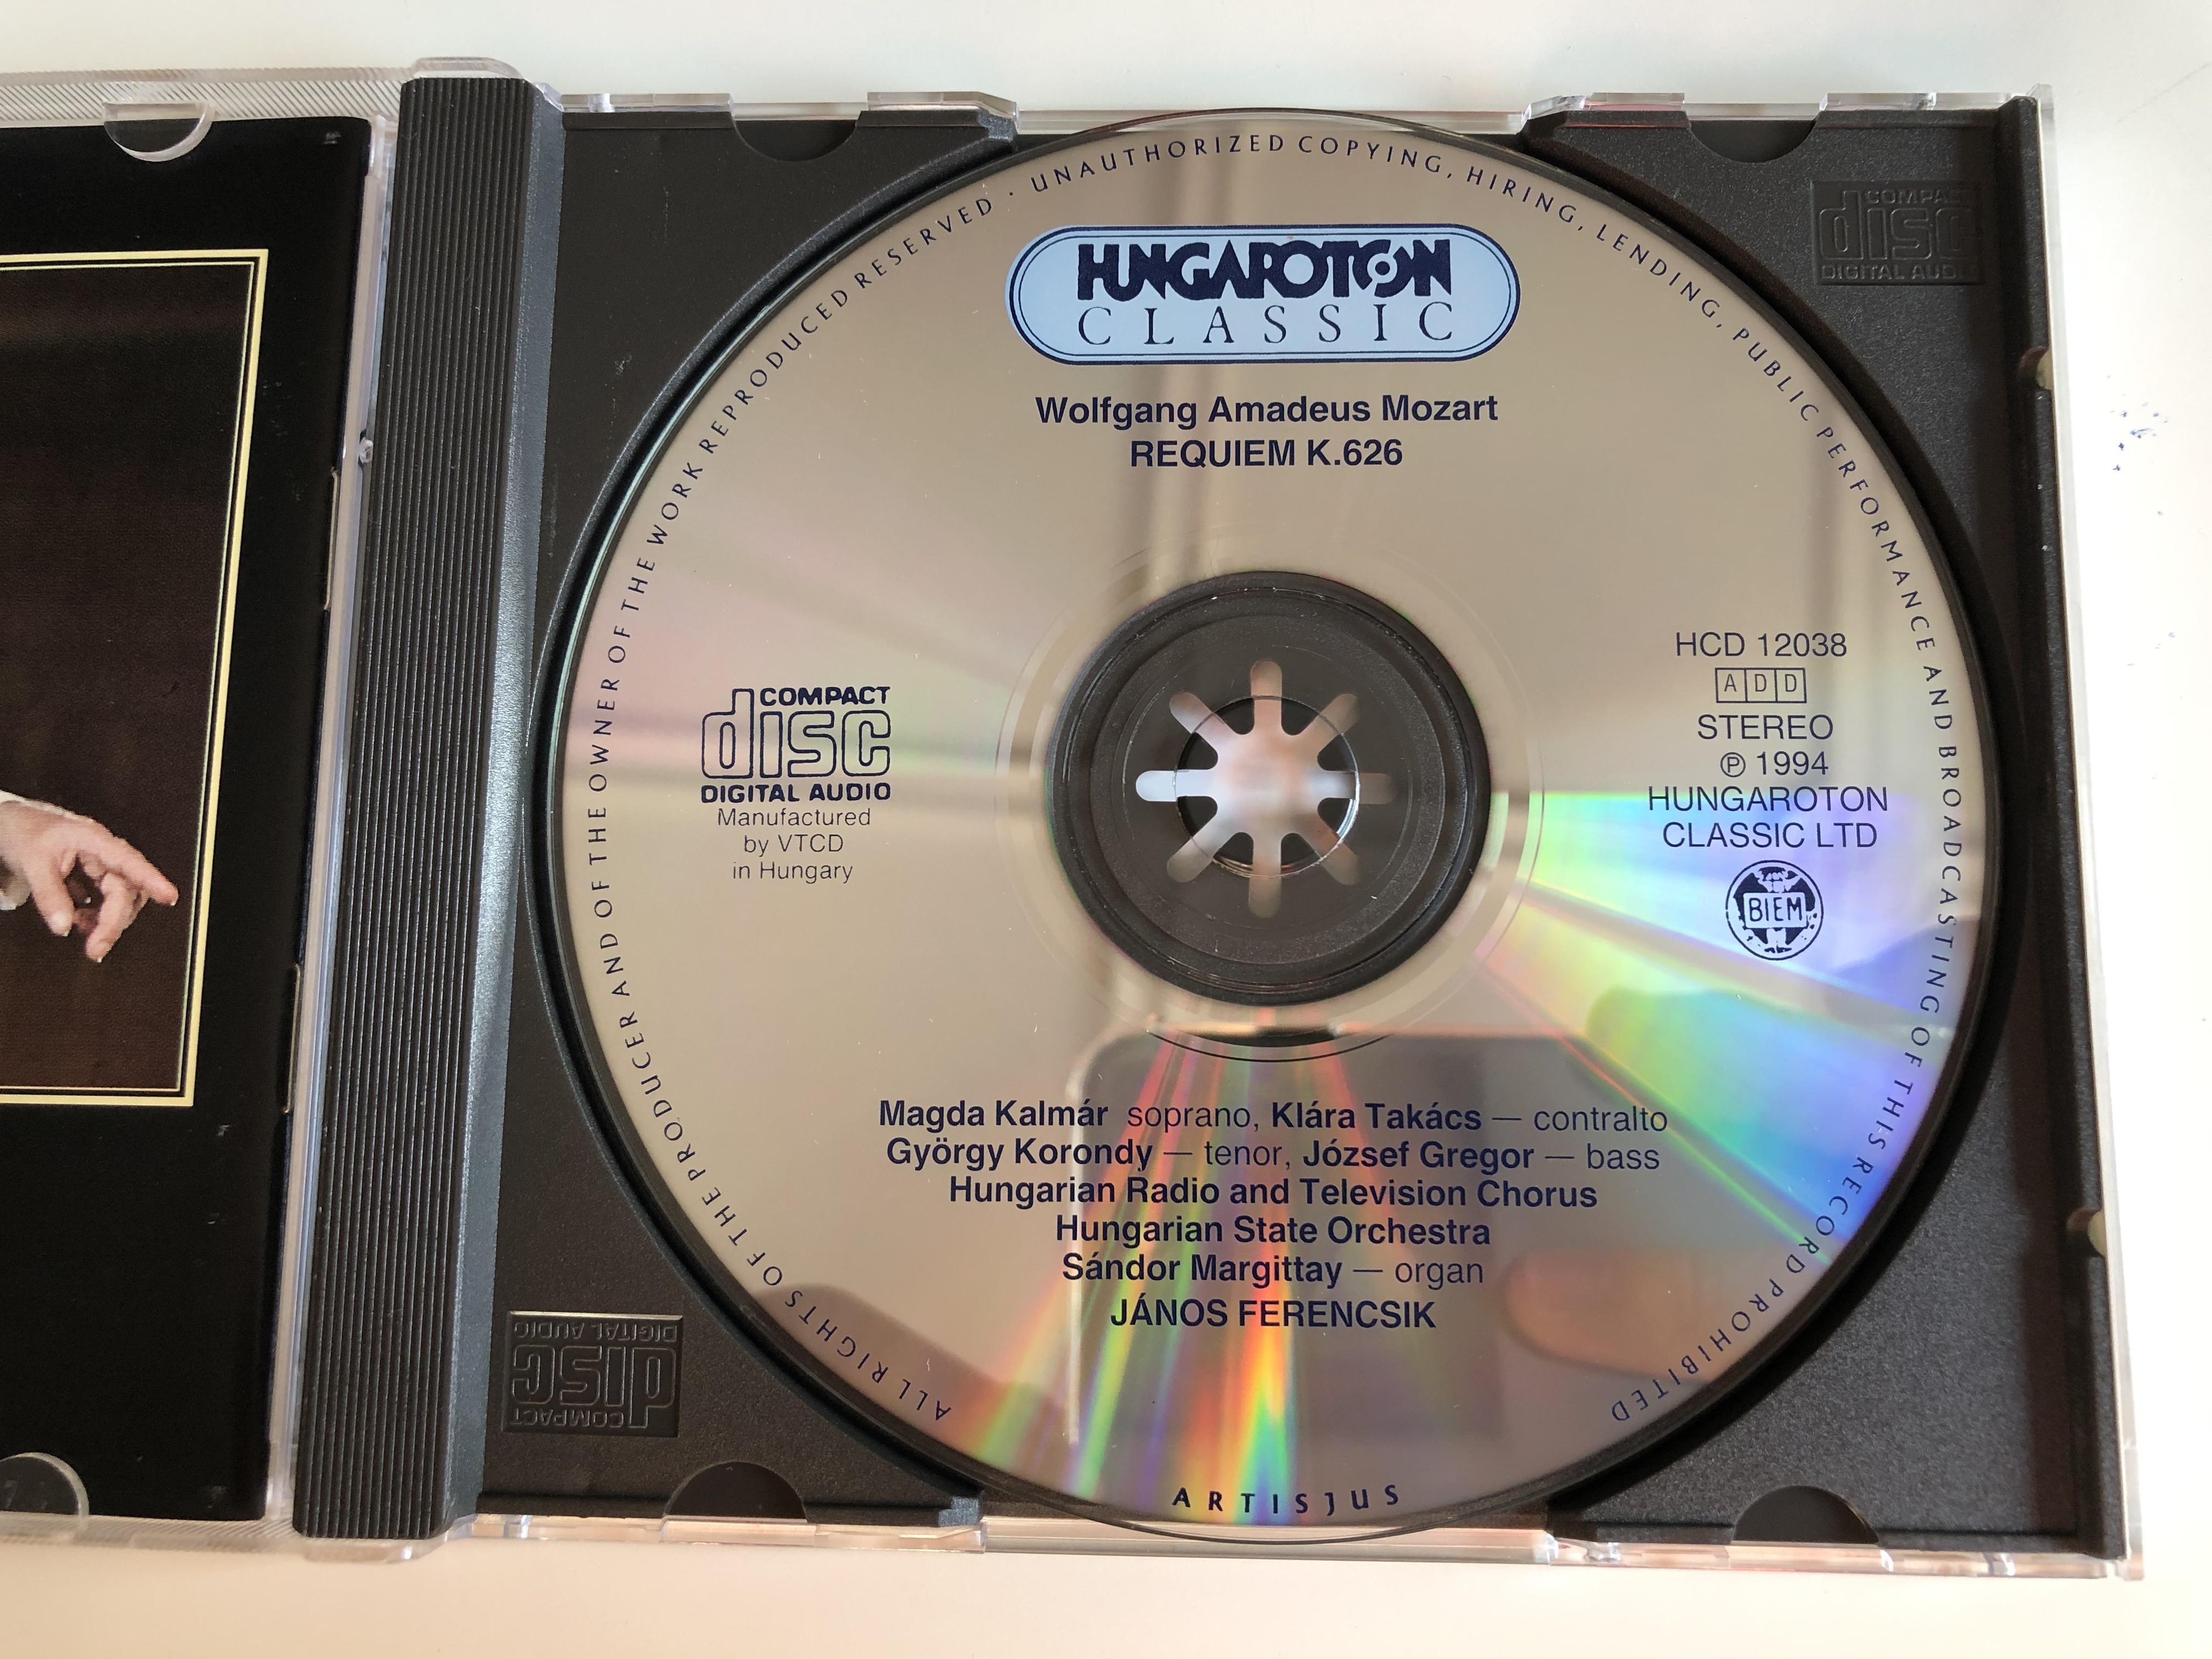 mozart-requiem-j-nos-ferencsik-magda-kalm-r-kl-ra-tak-cs-gy-rgy-korondy-j-zsef-gregor-hungarian-radio-and-television-chorus-hungarian-state-orchestra-hungaroton-classic-audio-cd-19-9-.jpg